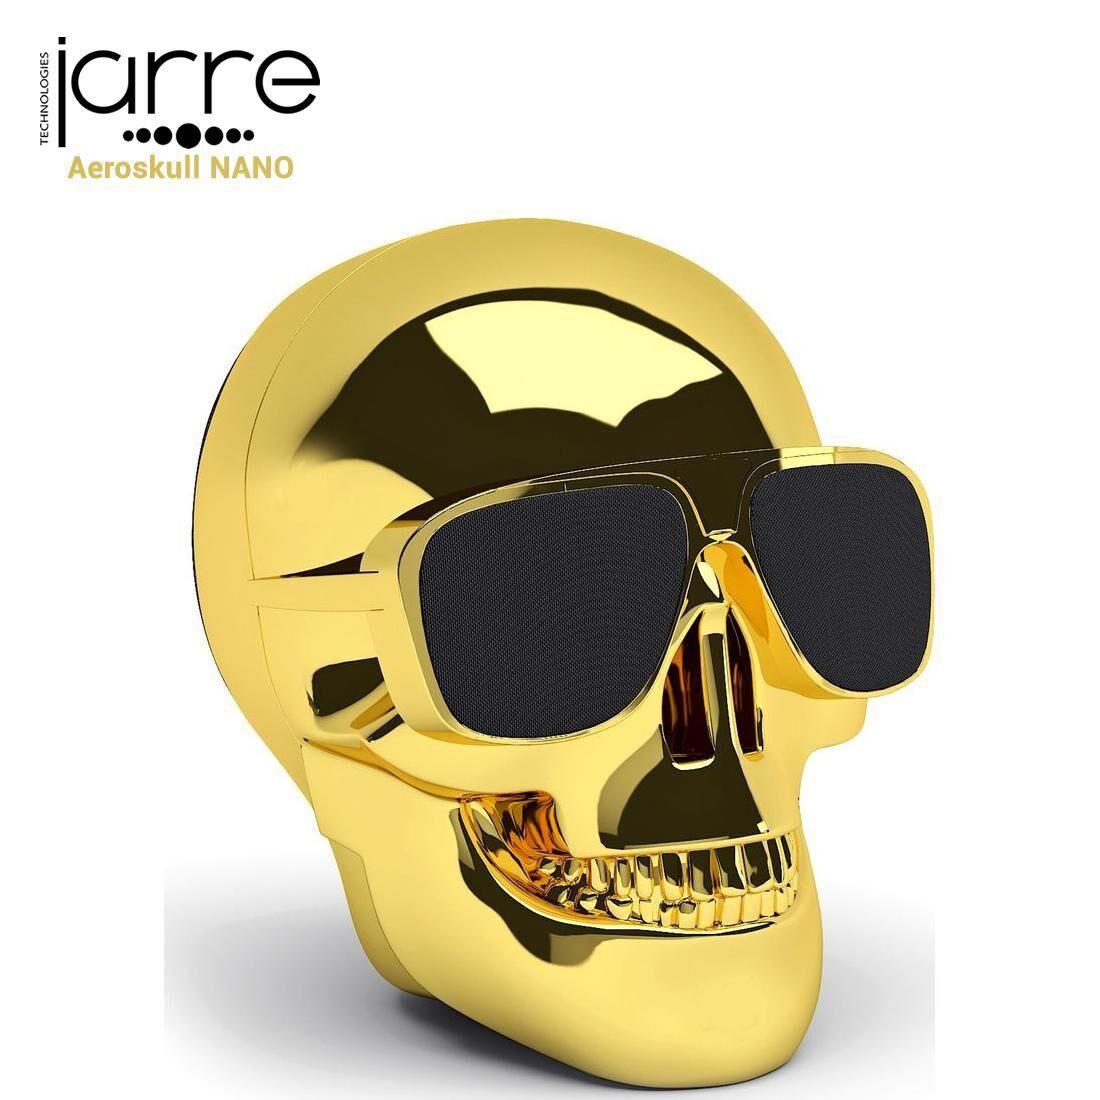 JARRE Enceinte Bluetooth, [AeroSkull Nano] Gold